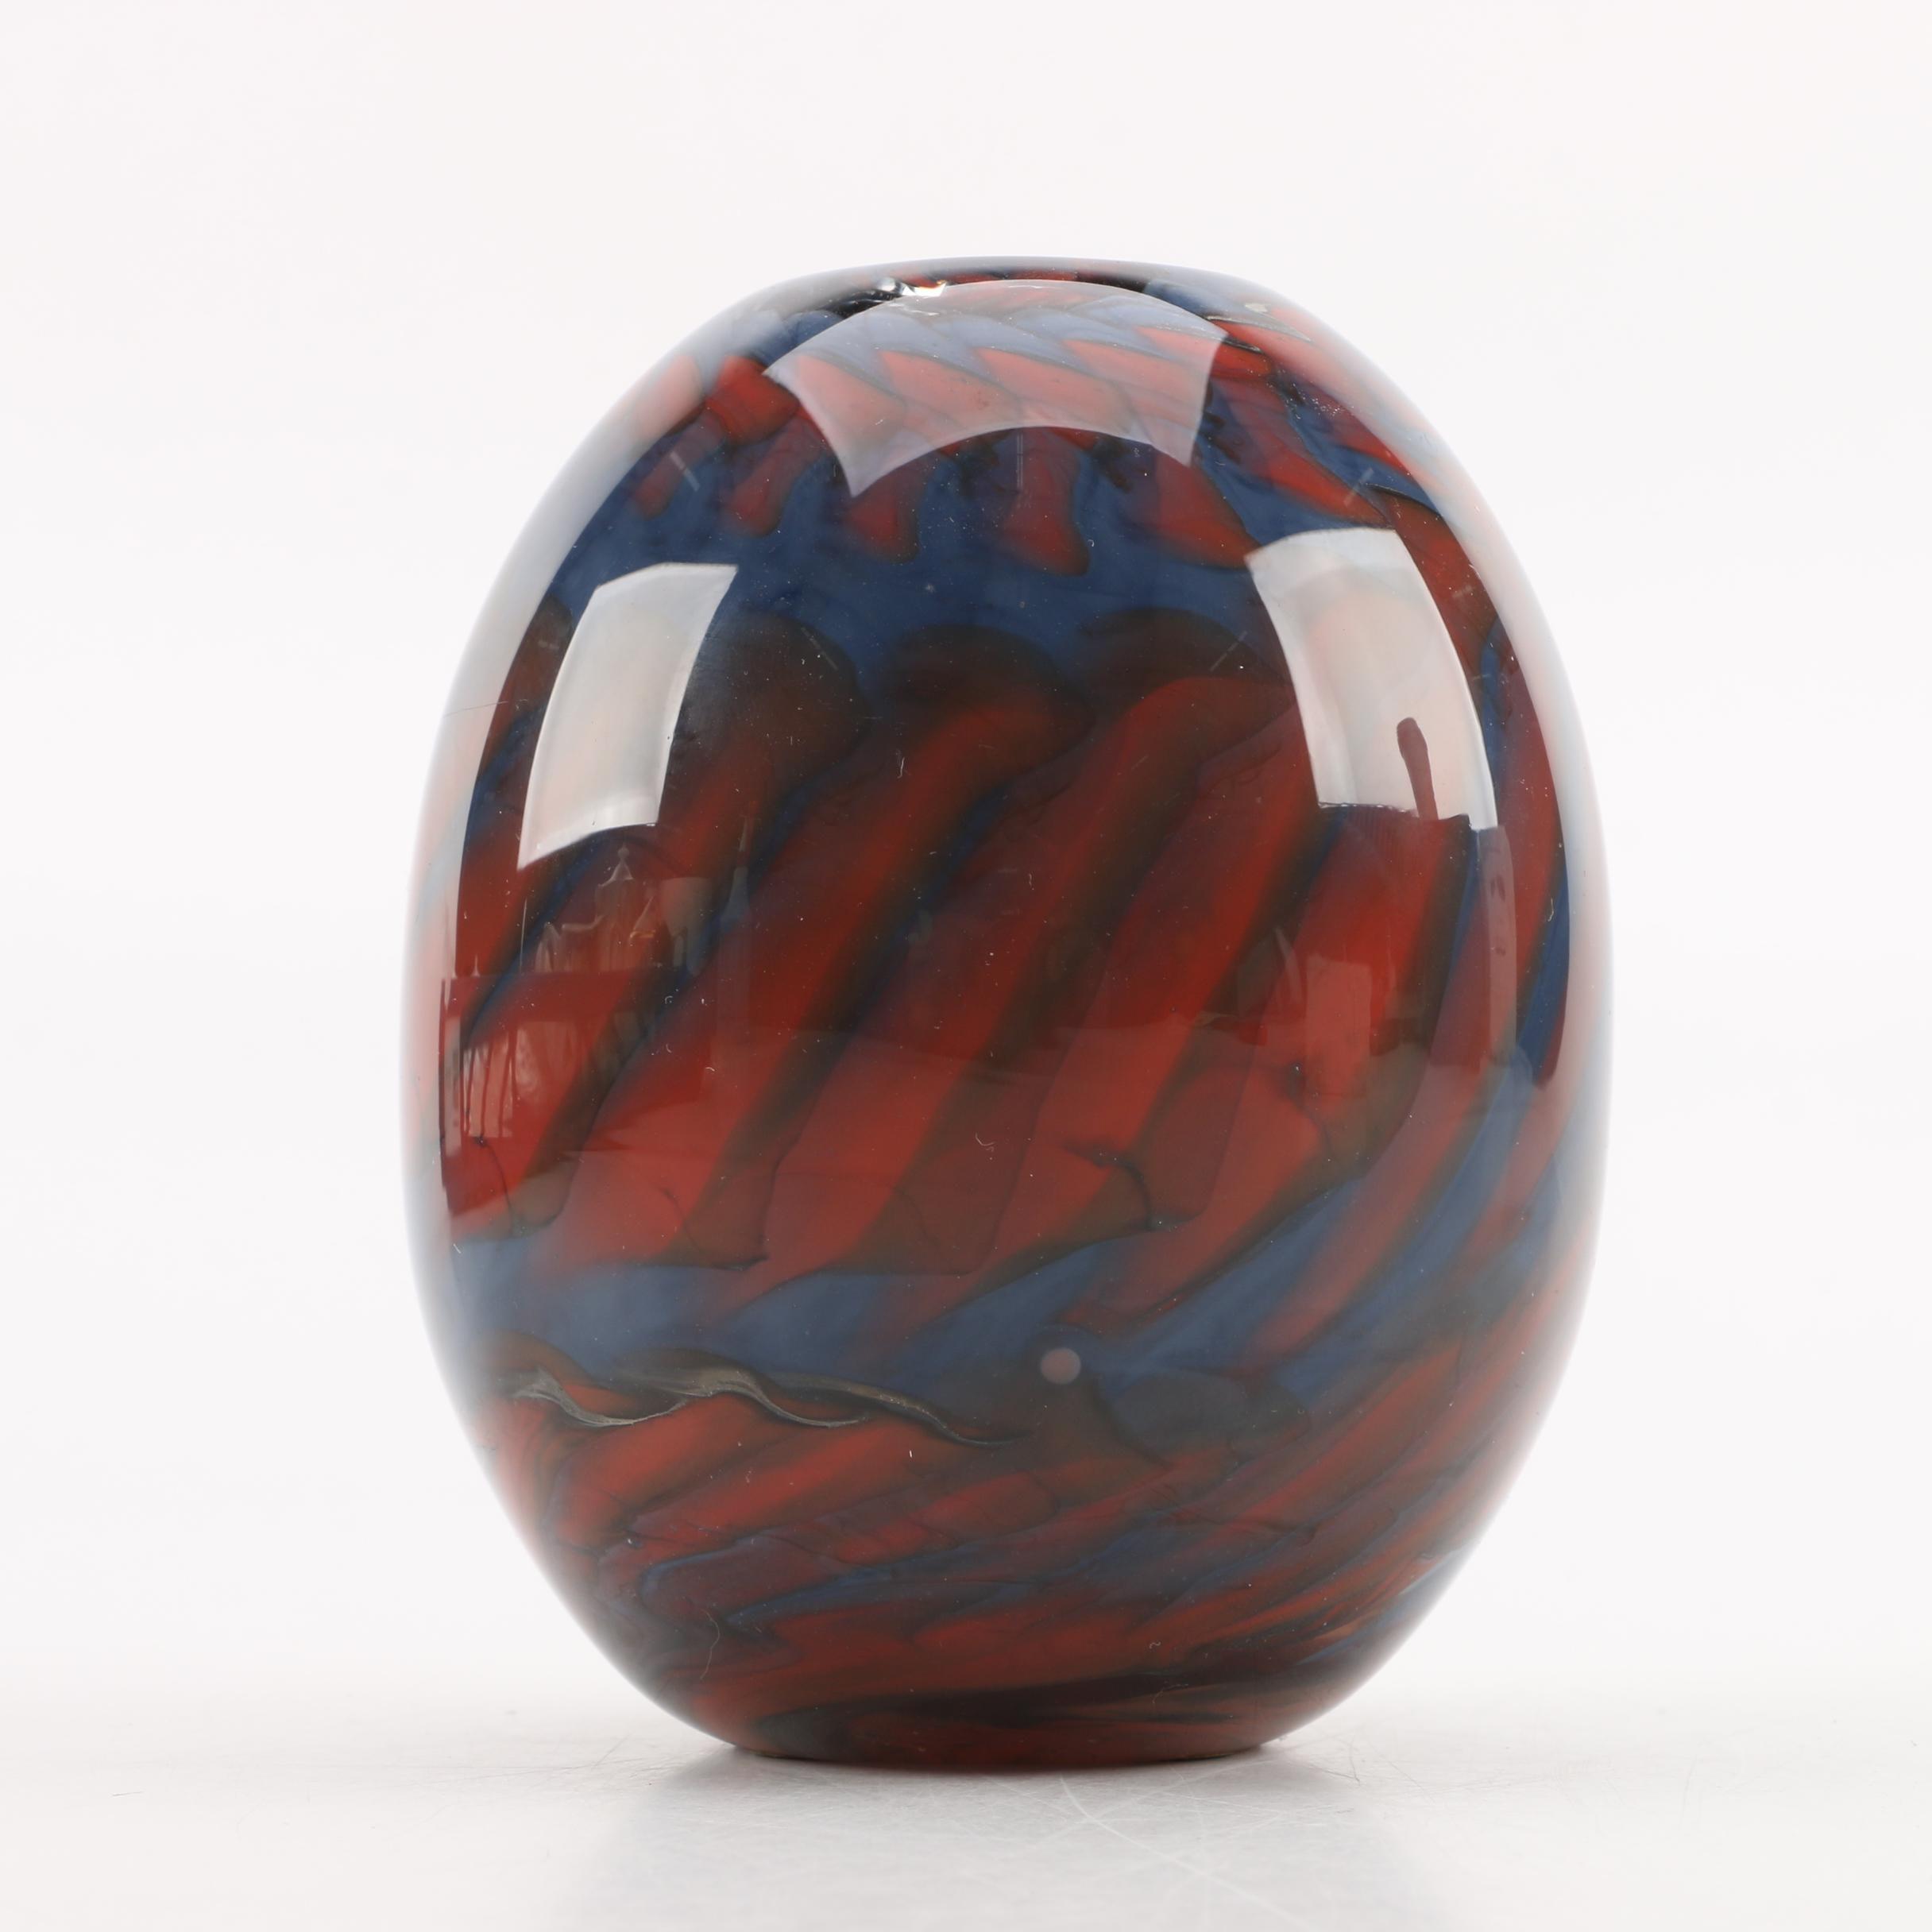 1978 Doug Sweet Art Glass Vase from Karuna Glass Co.